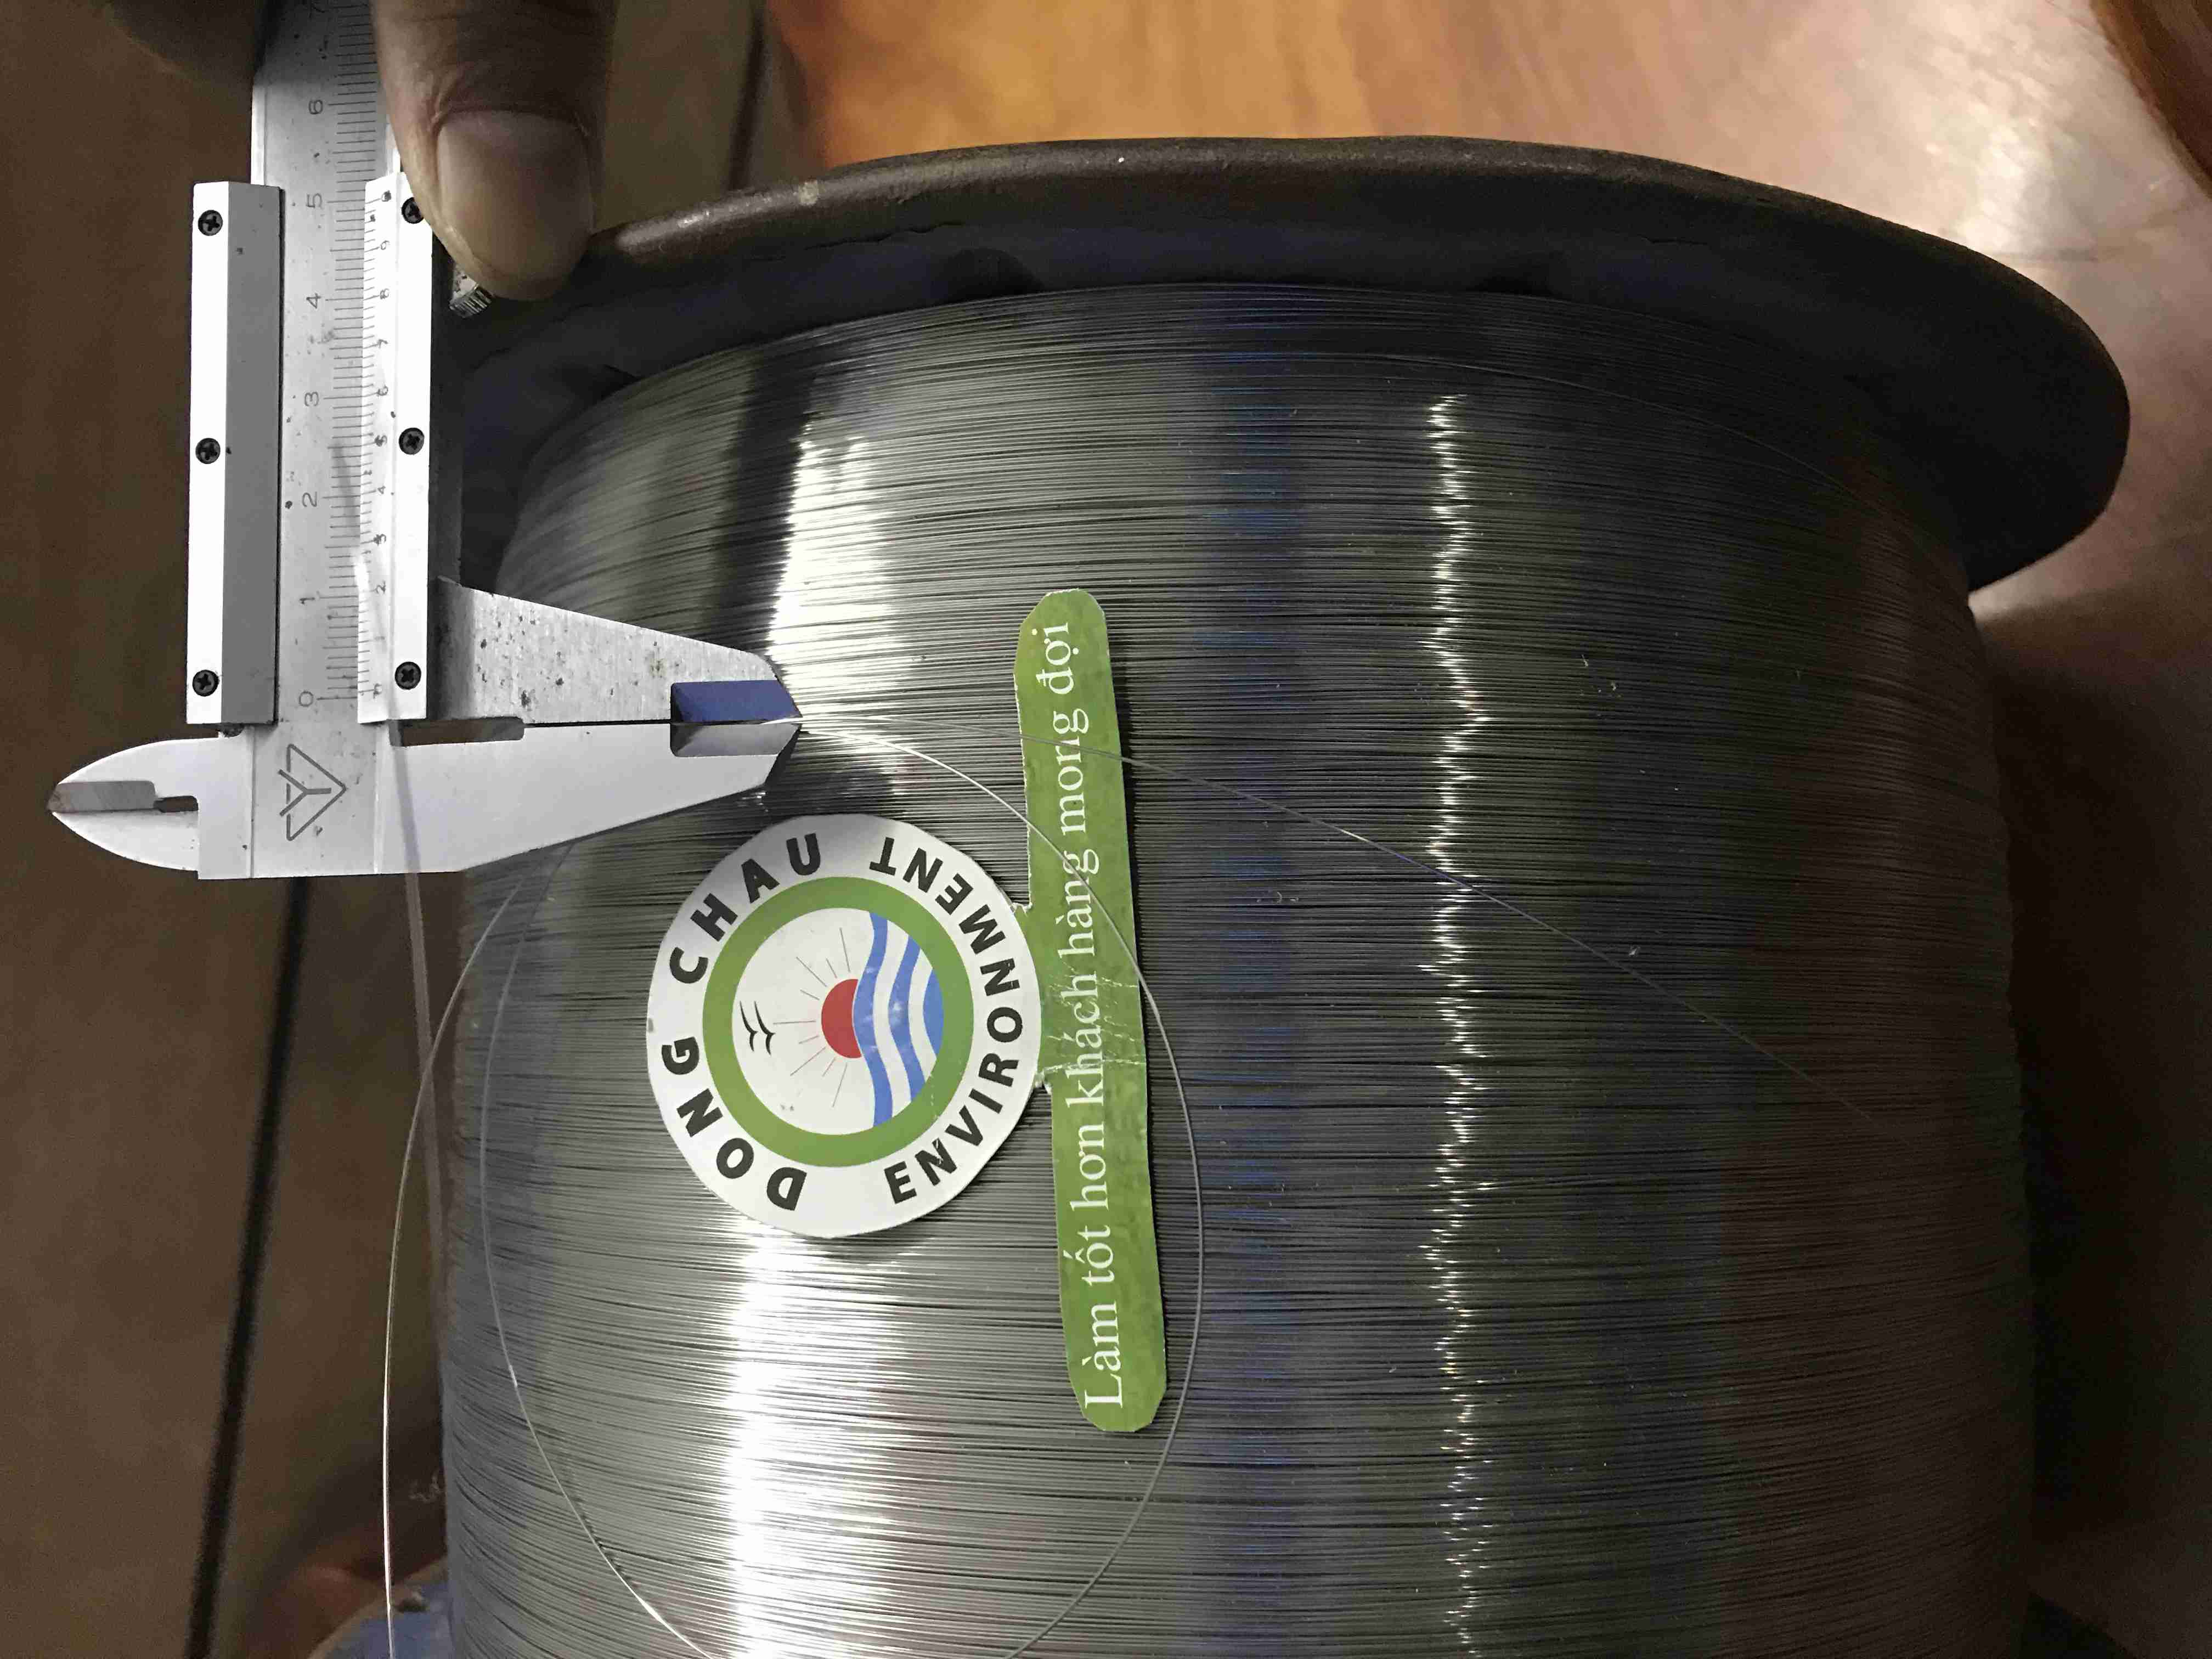 Cuộn sợi inox 0.5 mm